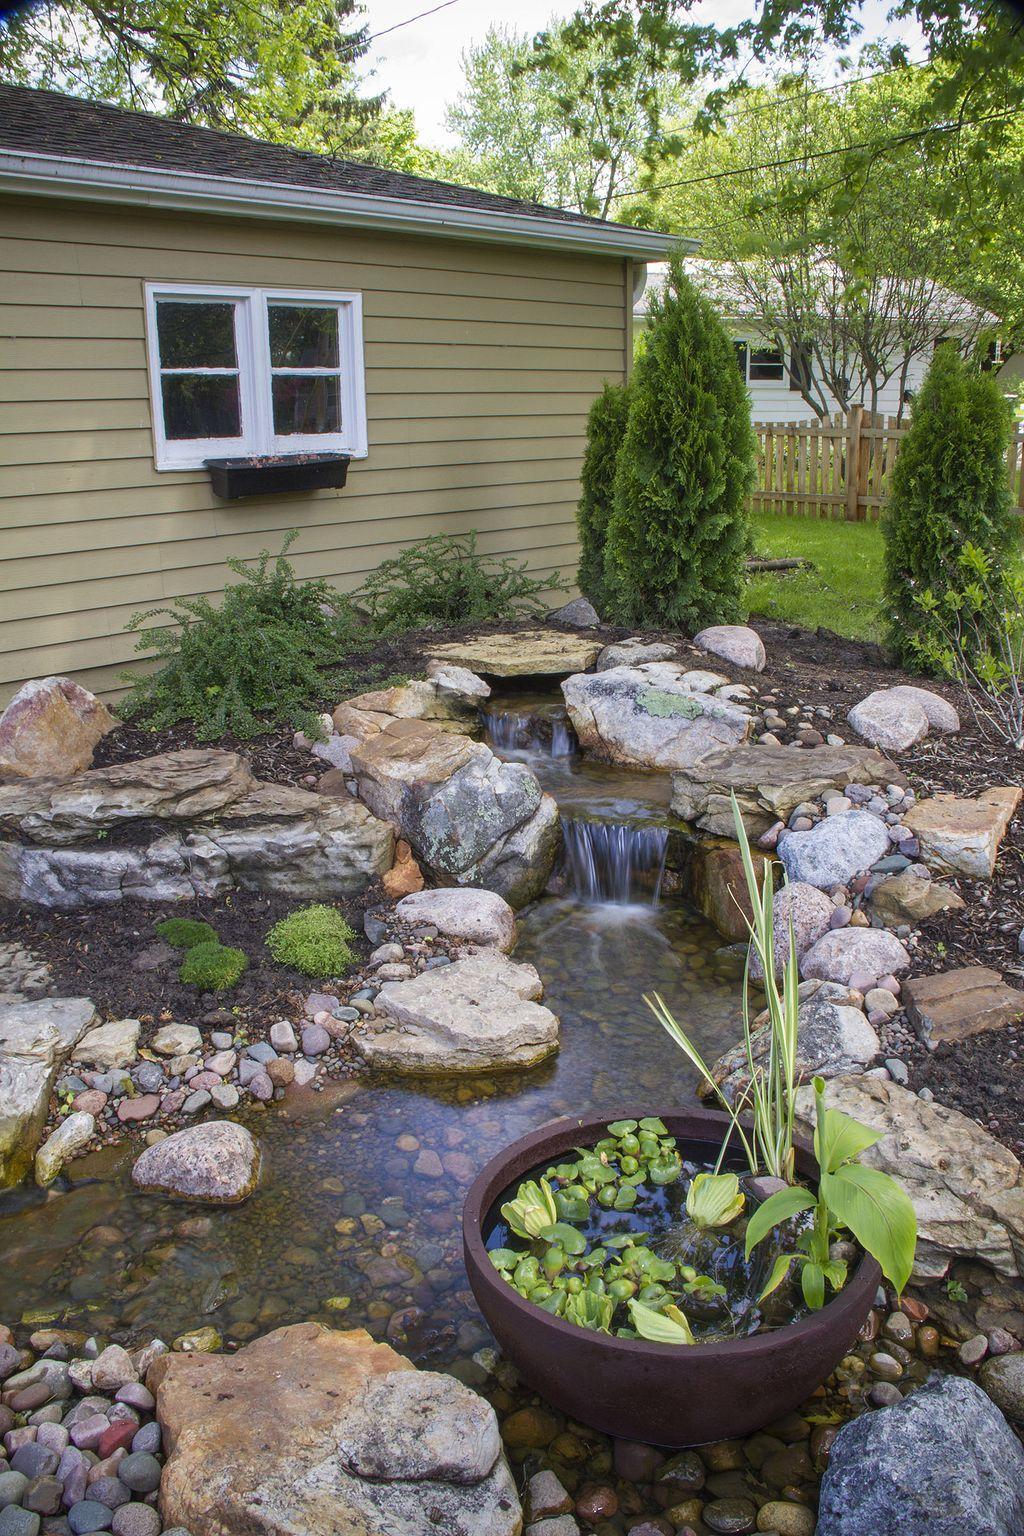 30+ Cute Small Water Feature Ideas in Backyard (With ... on Small Backyard Water Features id=21464